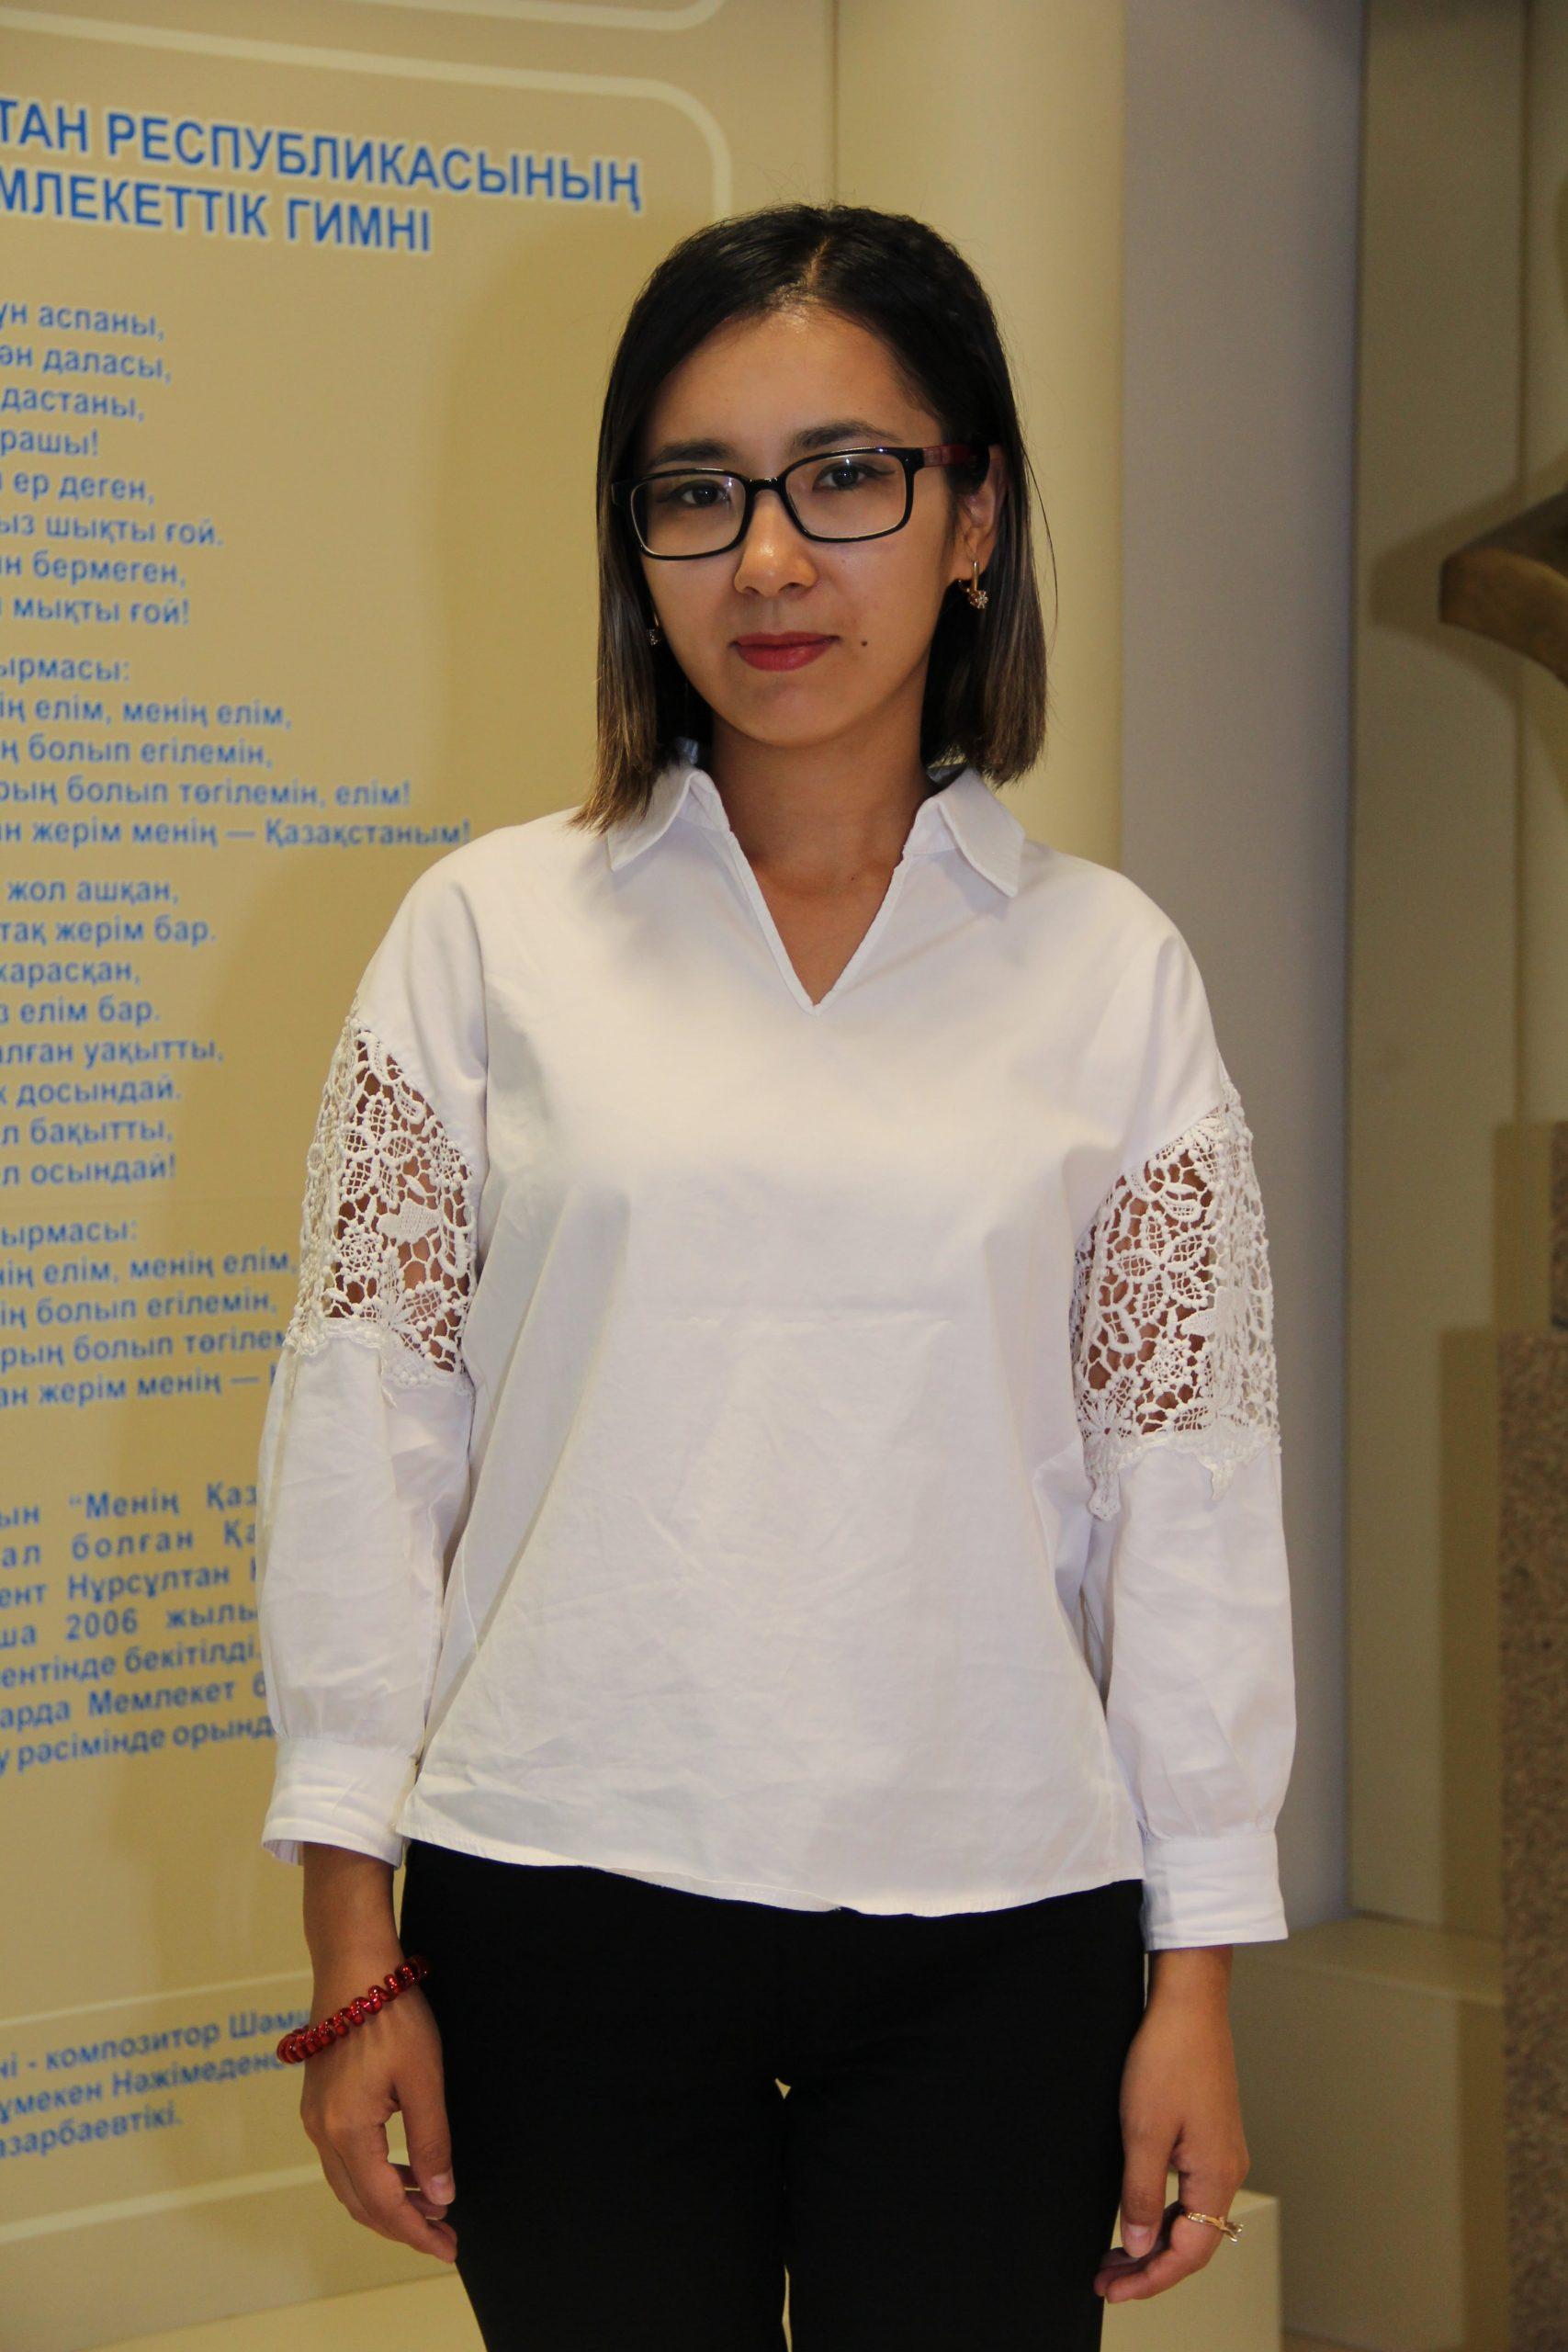 Айтенова Жадыра Болатовна